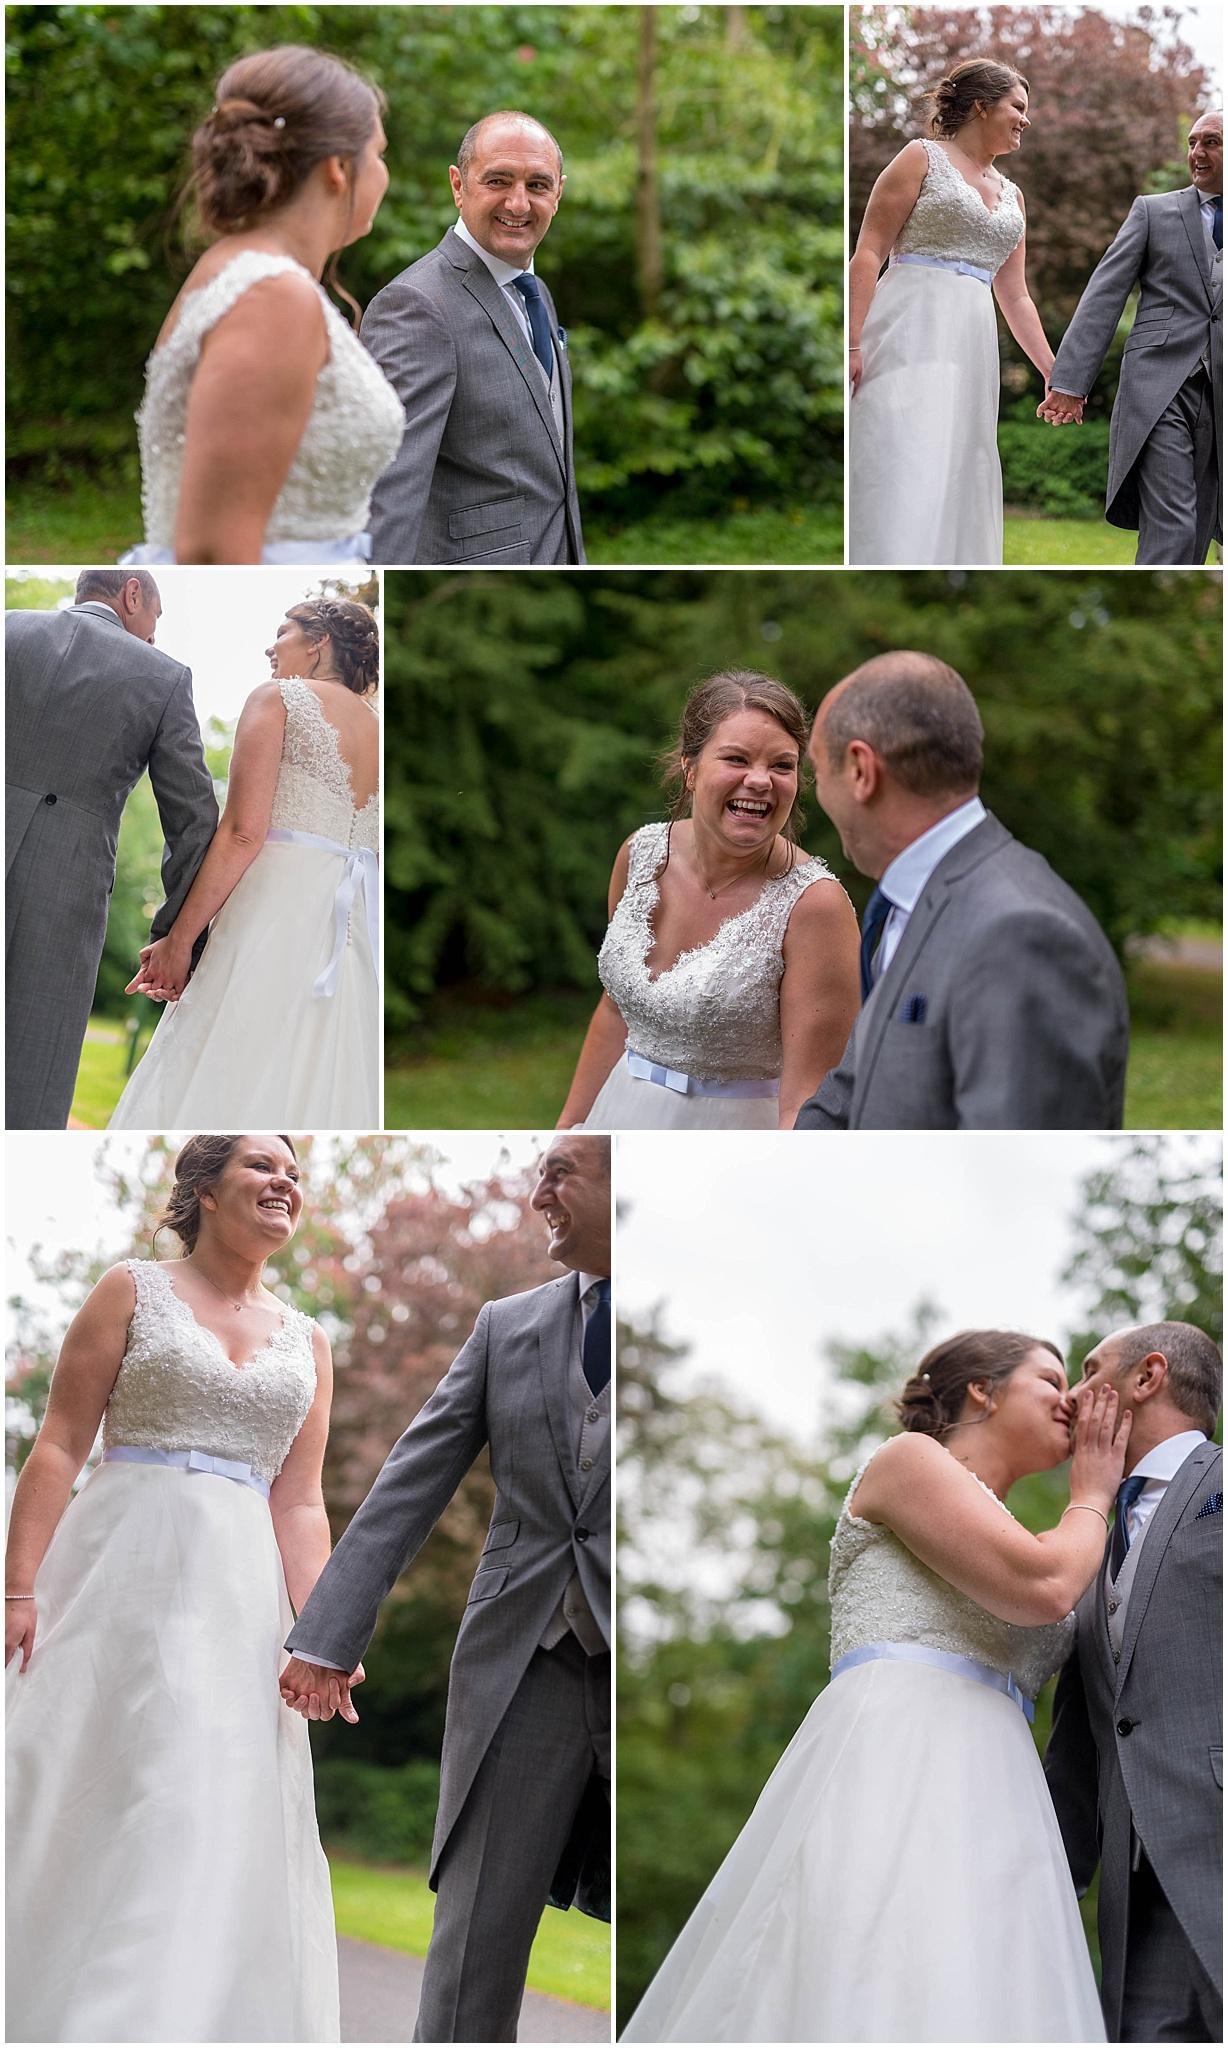 Crathorne Hall Hotel Wedding Photographer98.jpg